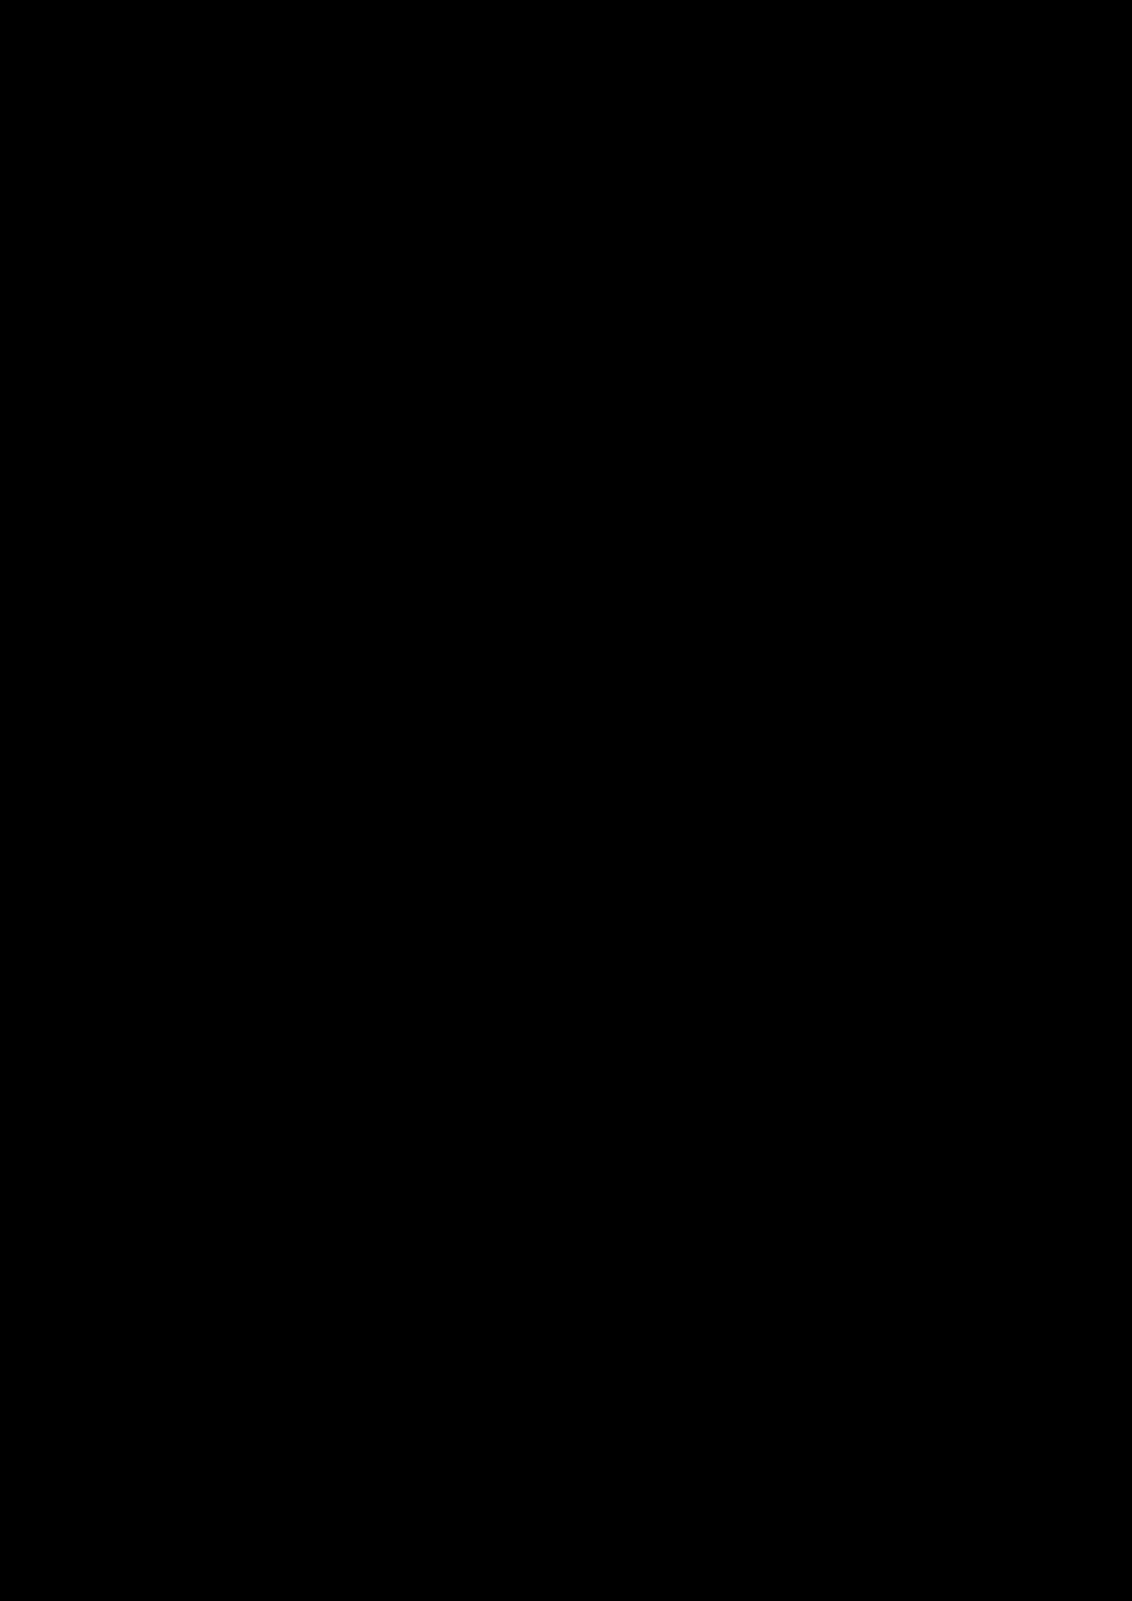 Belyiy sokol slide, Image 171